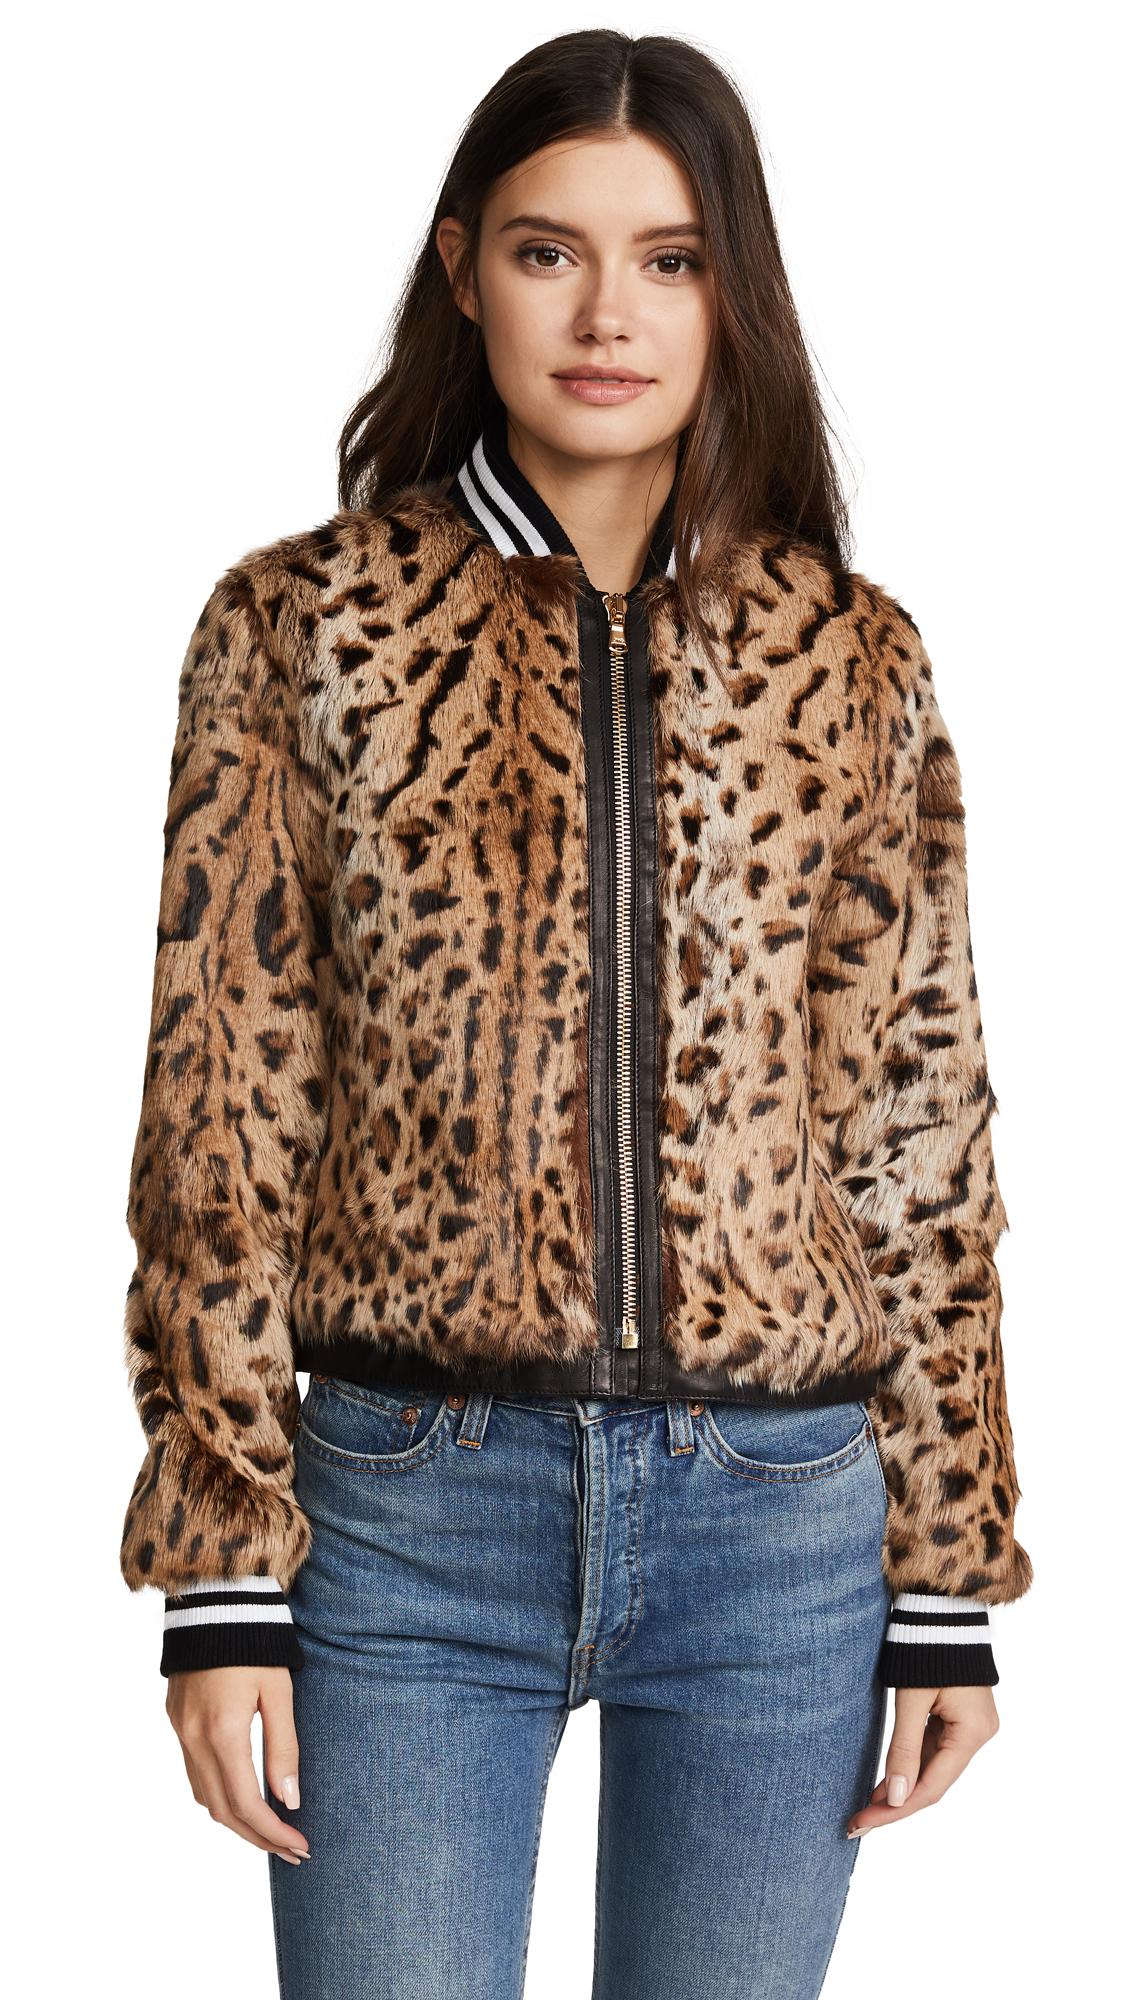 Veronica Beard Etta Fur Jacket - Leopard